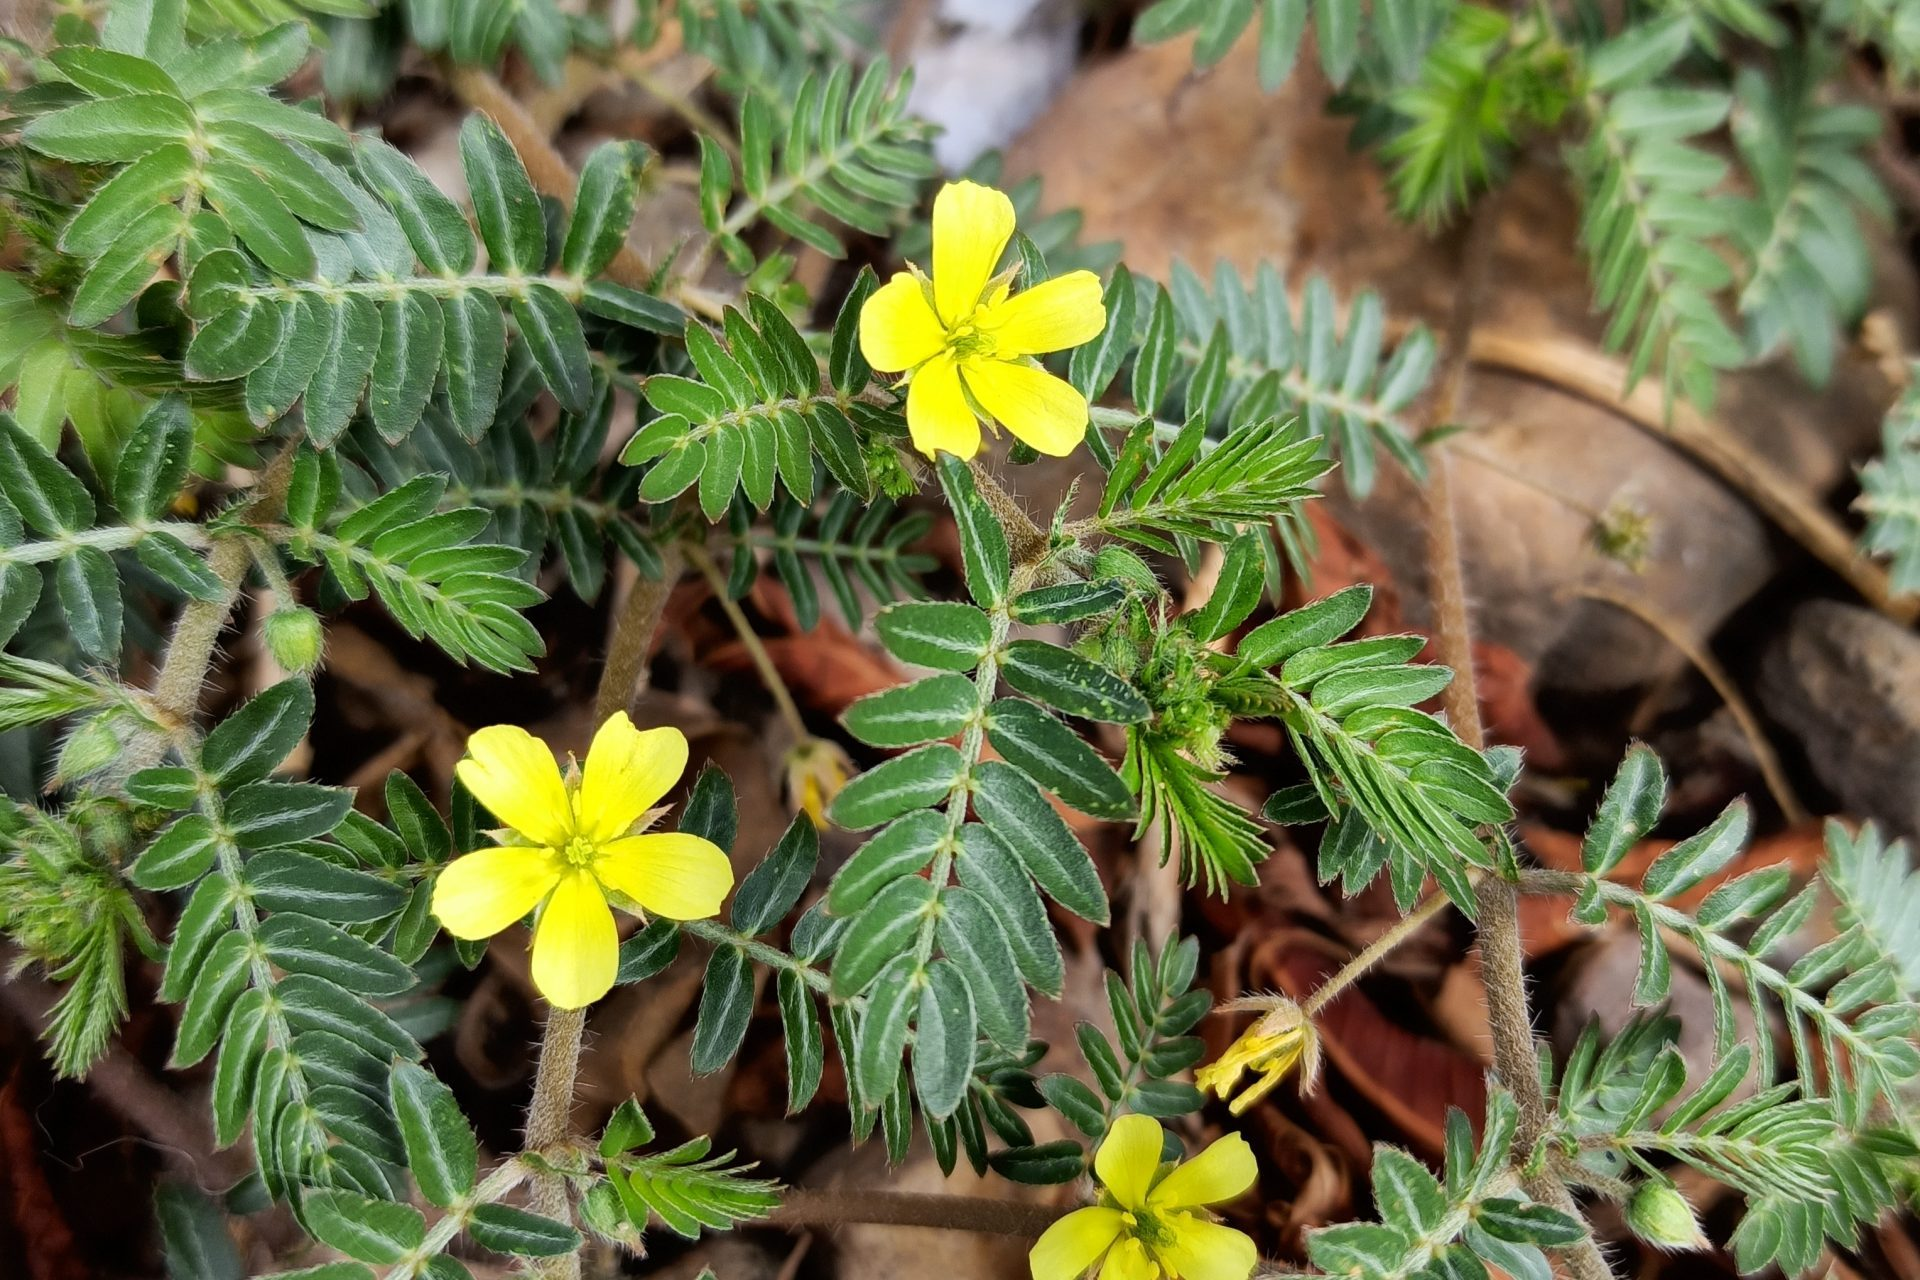 Tribulus_terrestris_(Family_Zygophyllaceae)